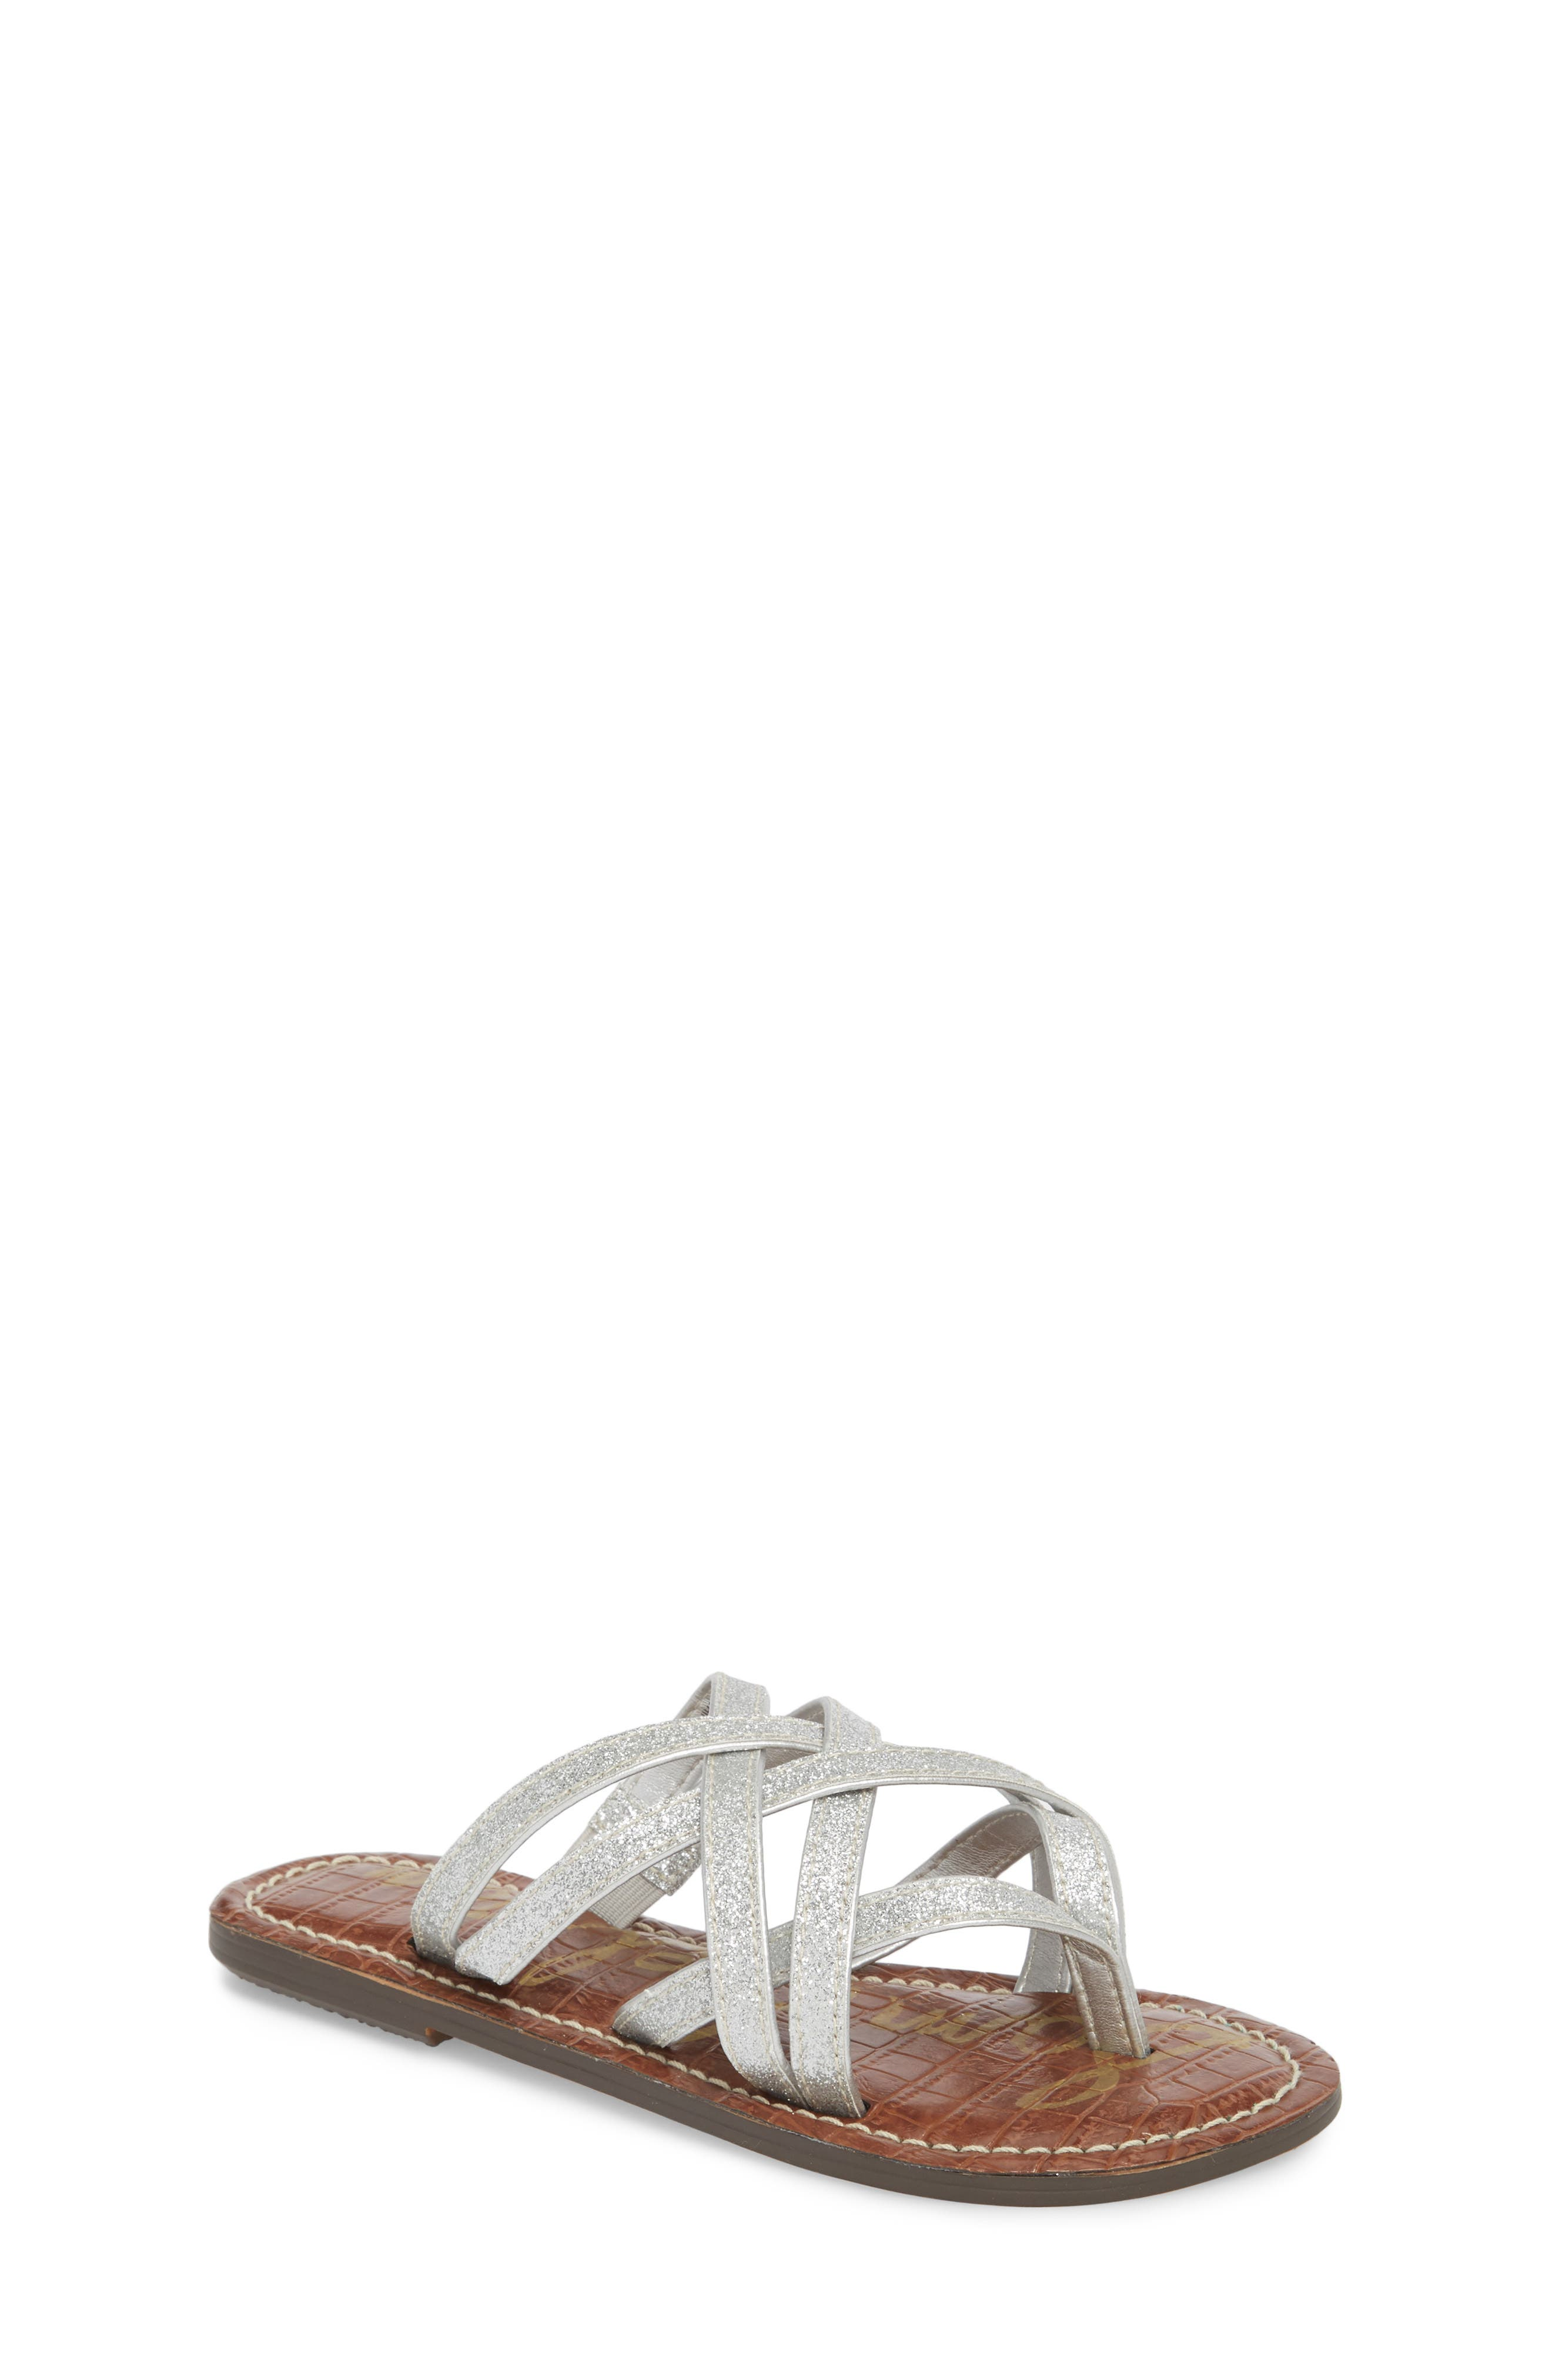 Georgette Glitter Flat Sandal,                         Main,                         color, 040